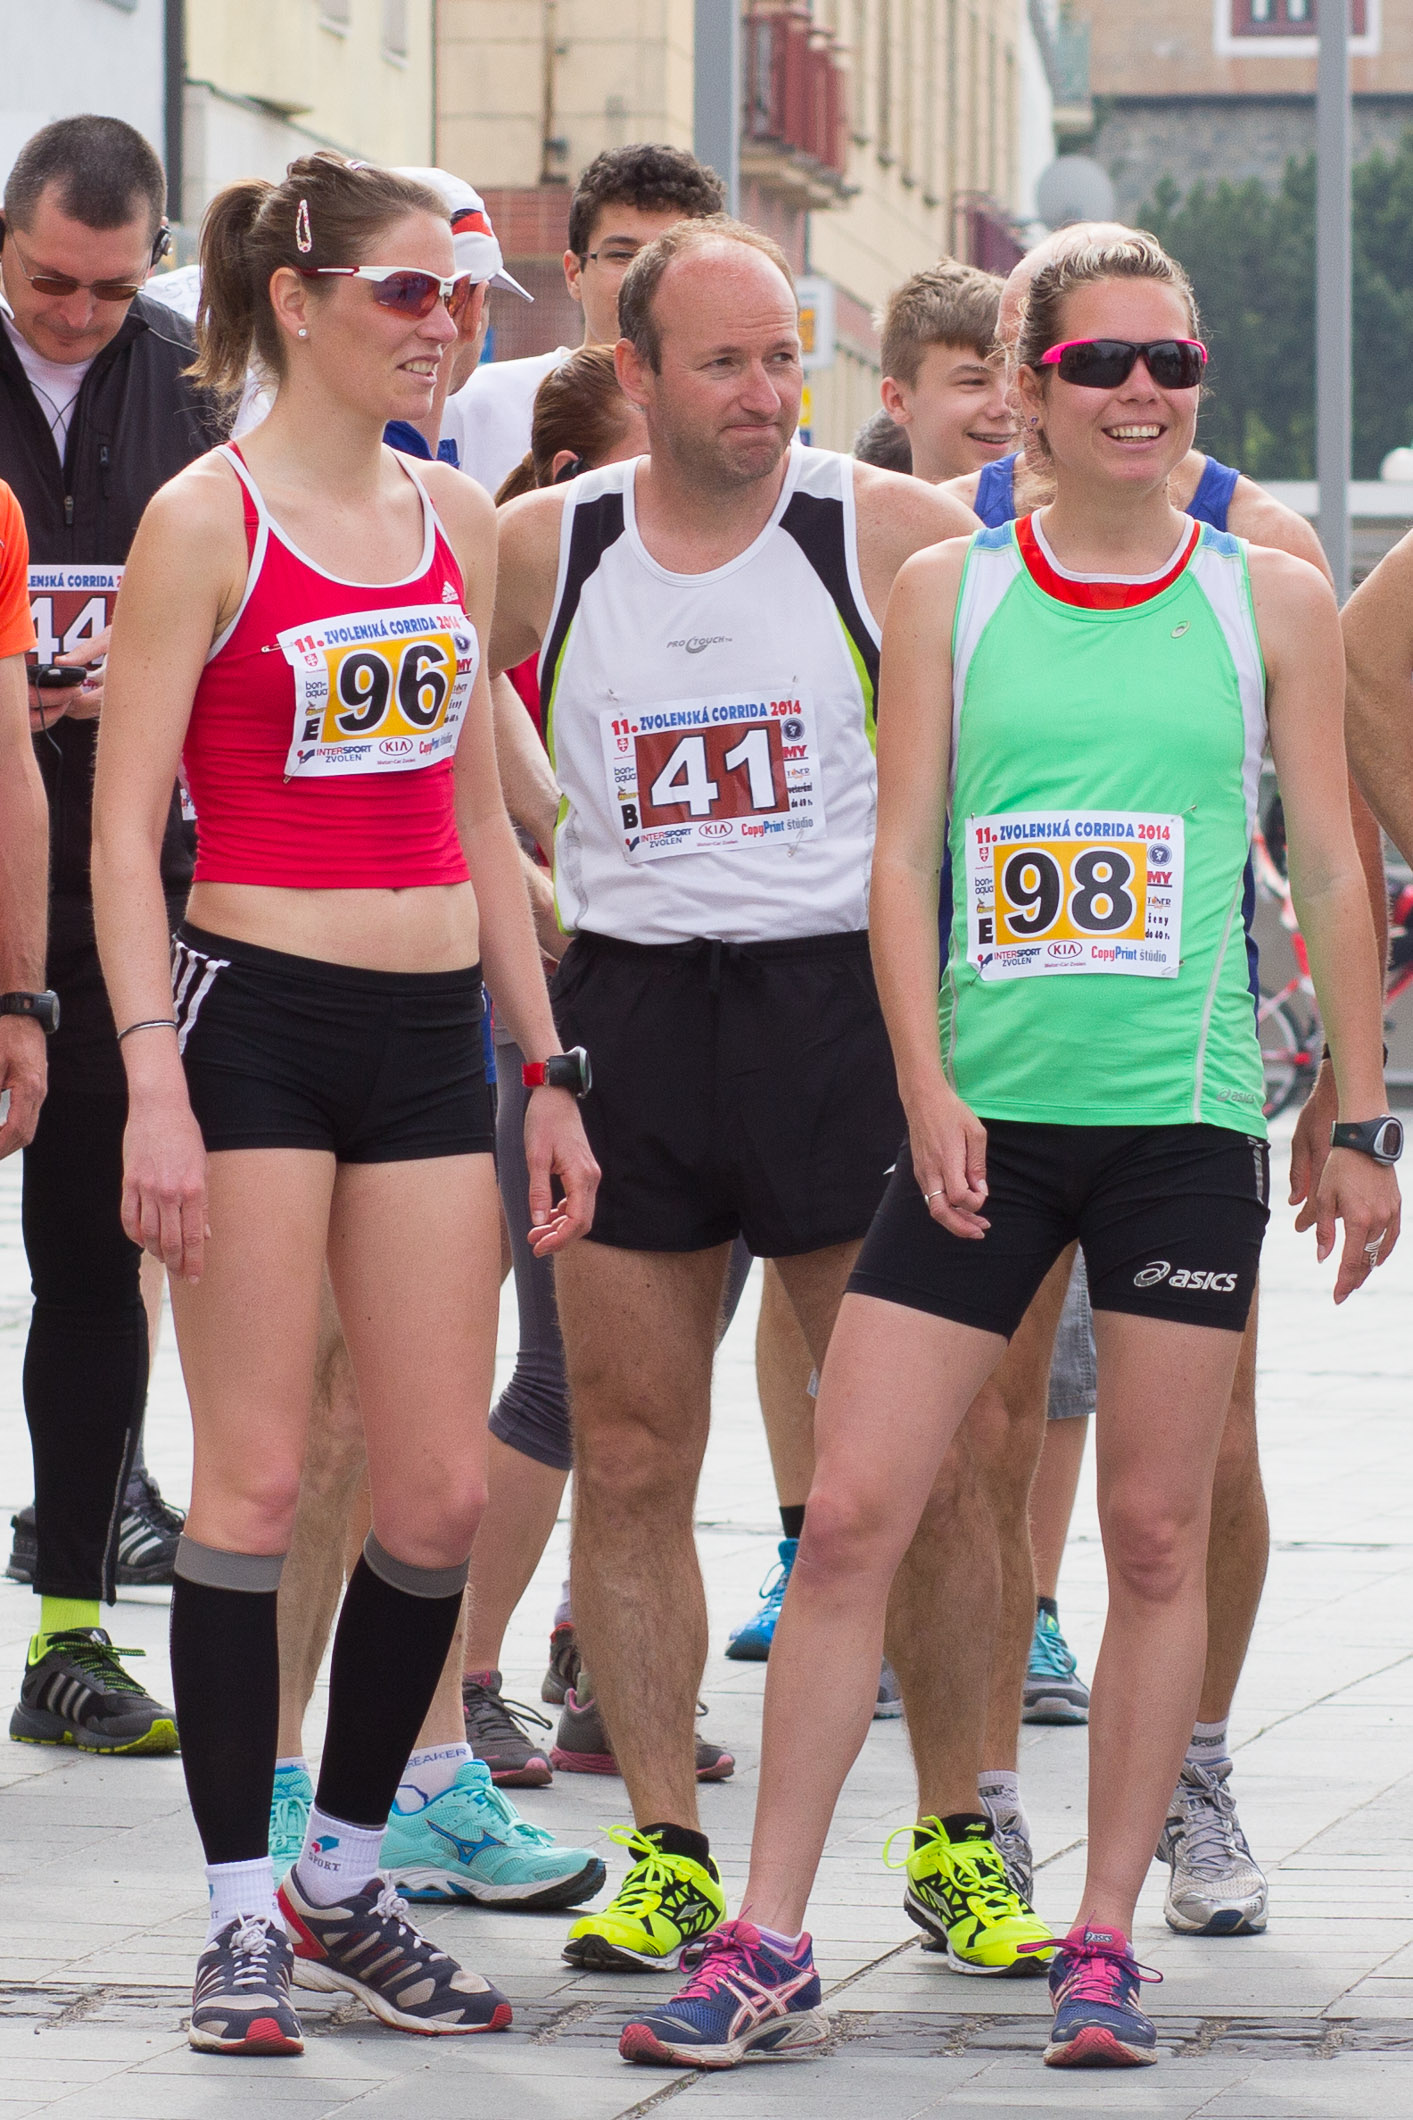 zvolenska-corrida-2014-11-rocnik-51